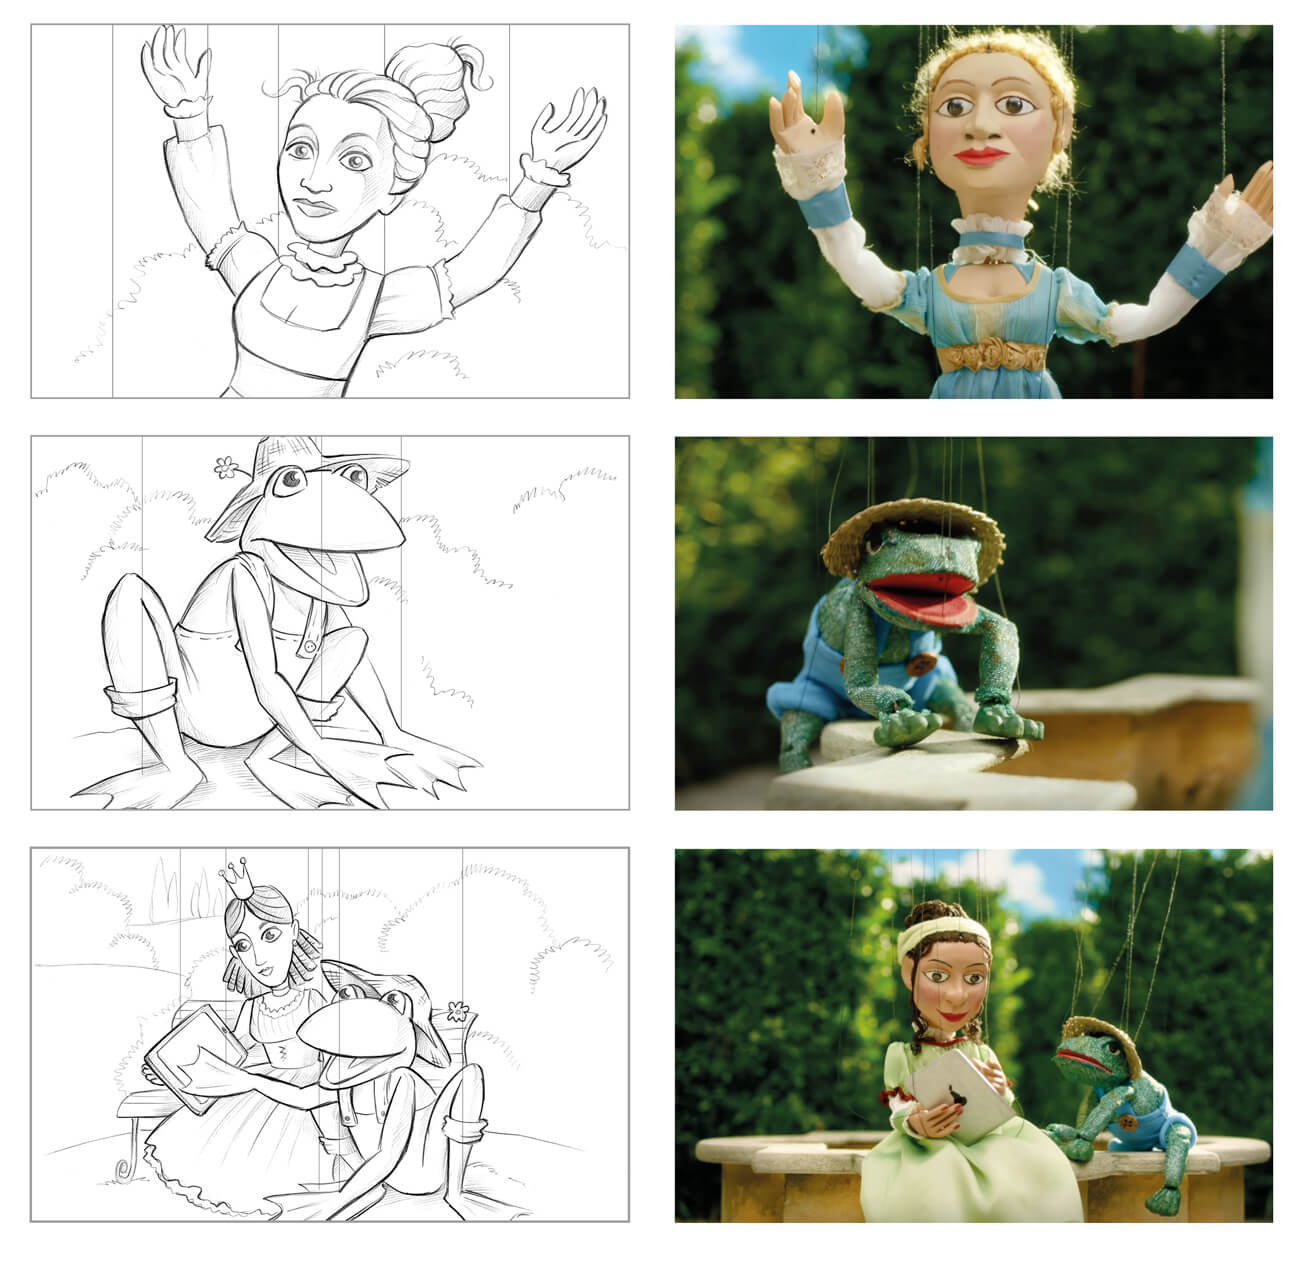 Minijob_Storyboard_2_Webt